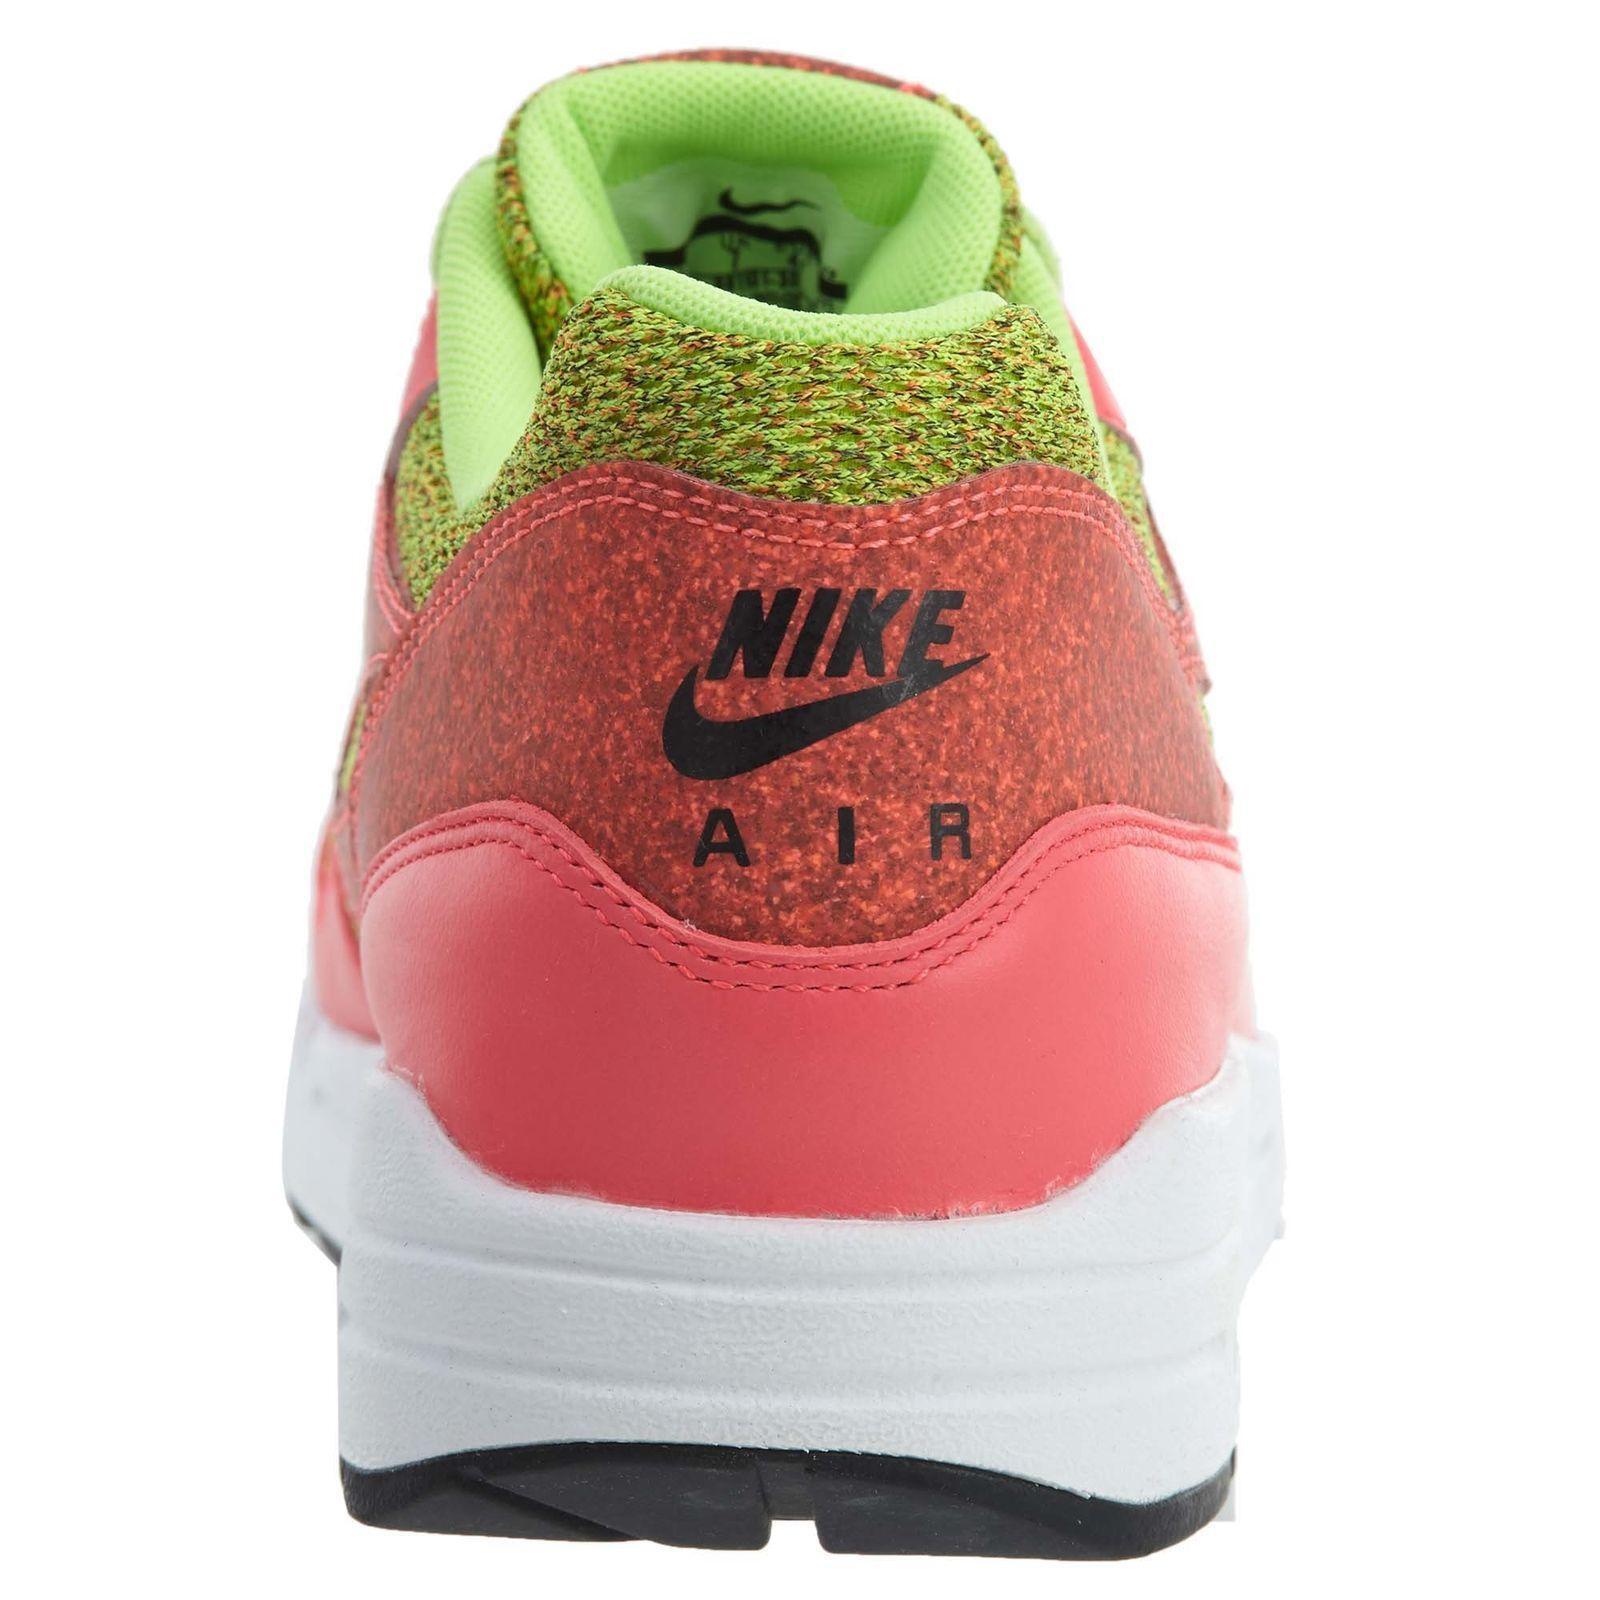 Damenschuhe Nike W Air Max 1 SE 300 Ghost Green Trainers 881101 300 SE 18dd1d